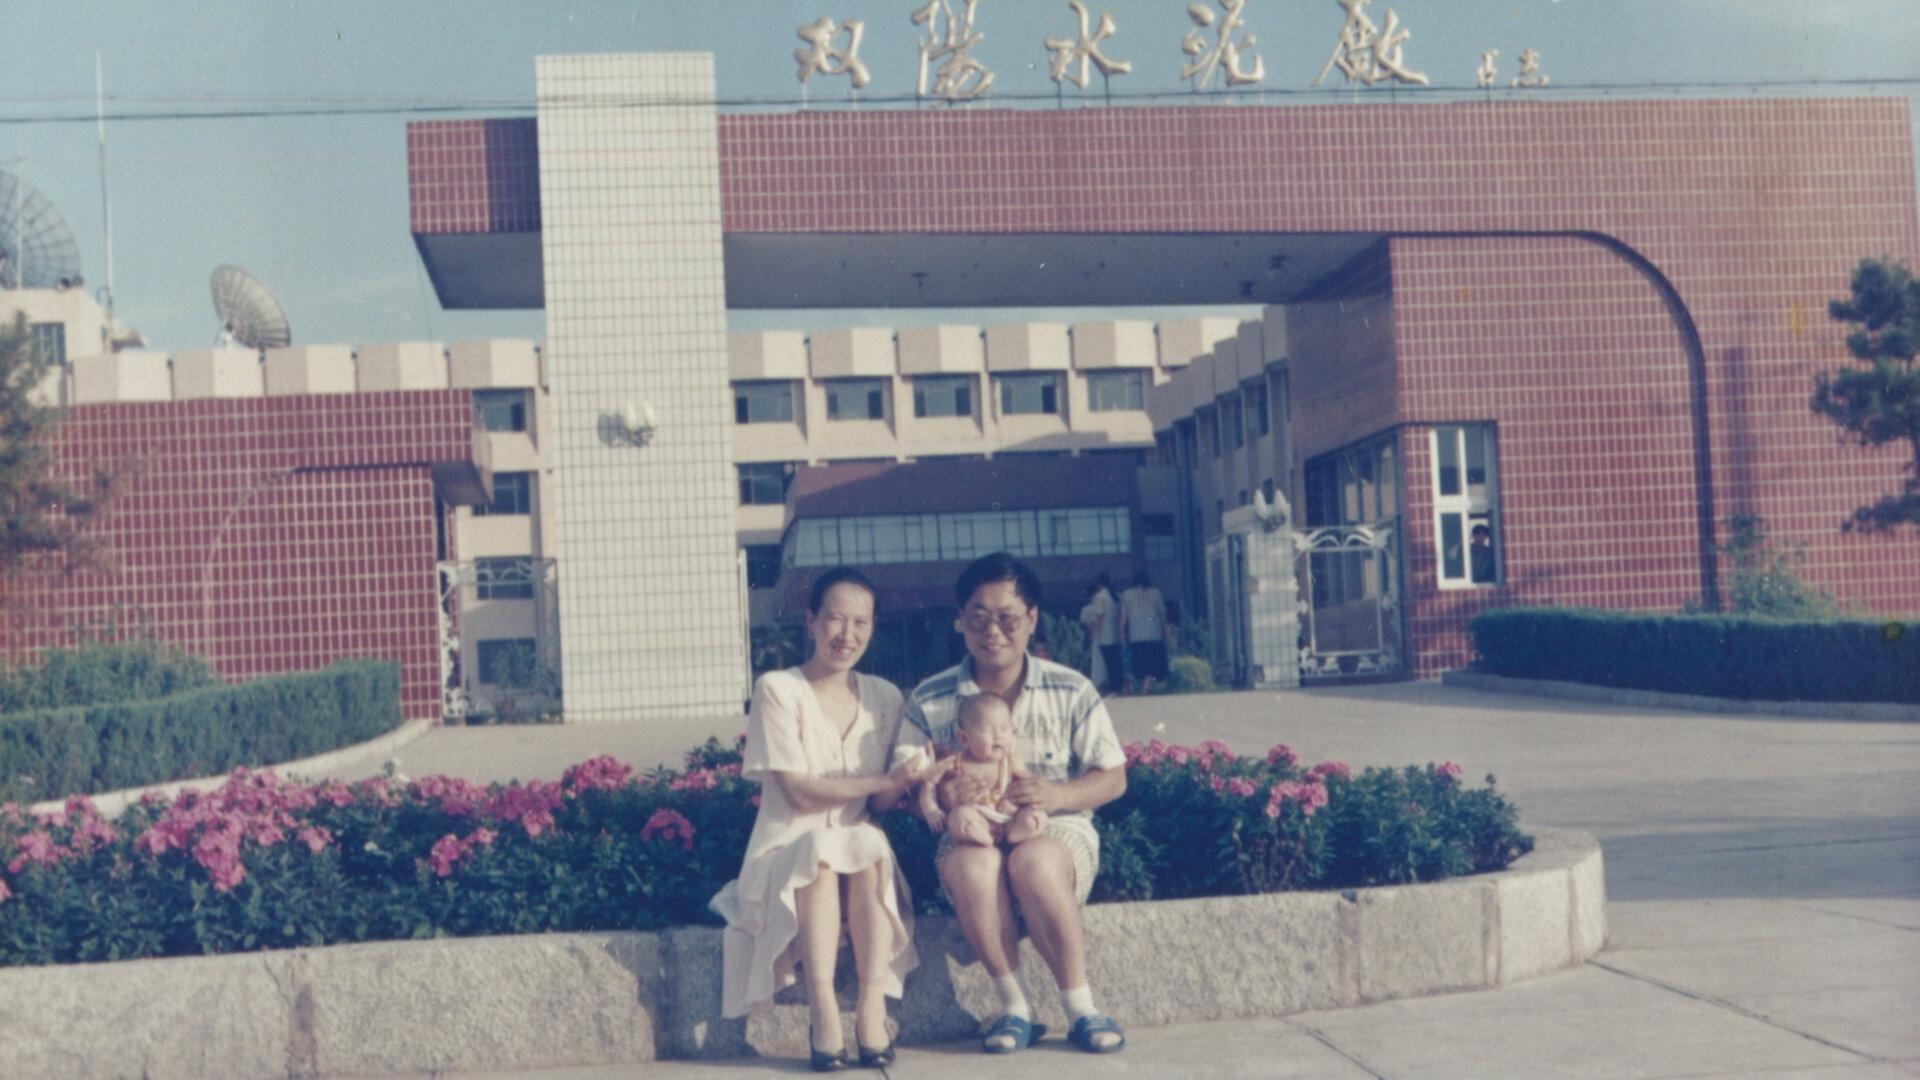 Zhang_Hanwen_SS00145860.jpg